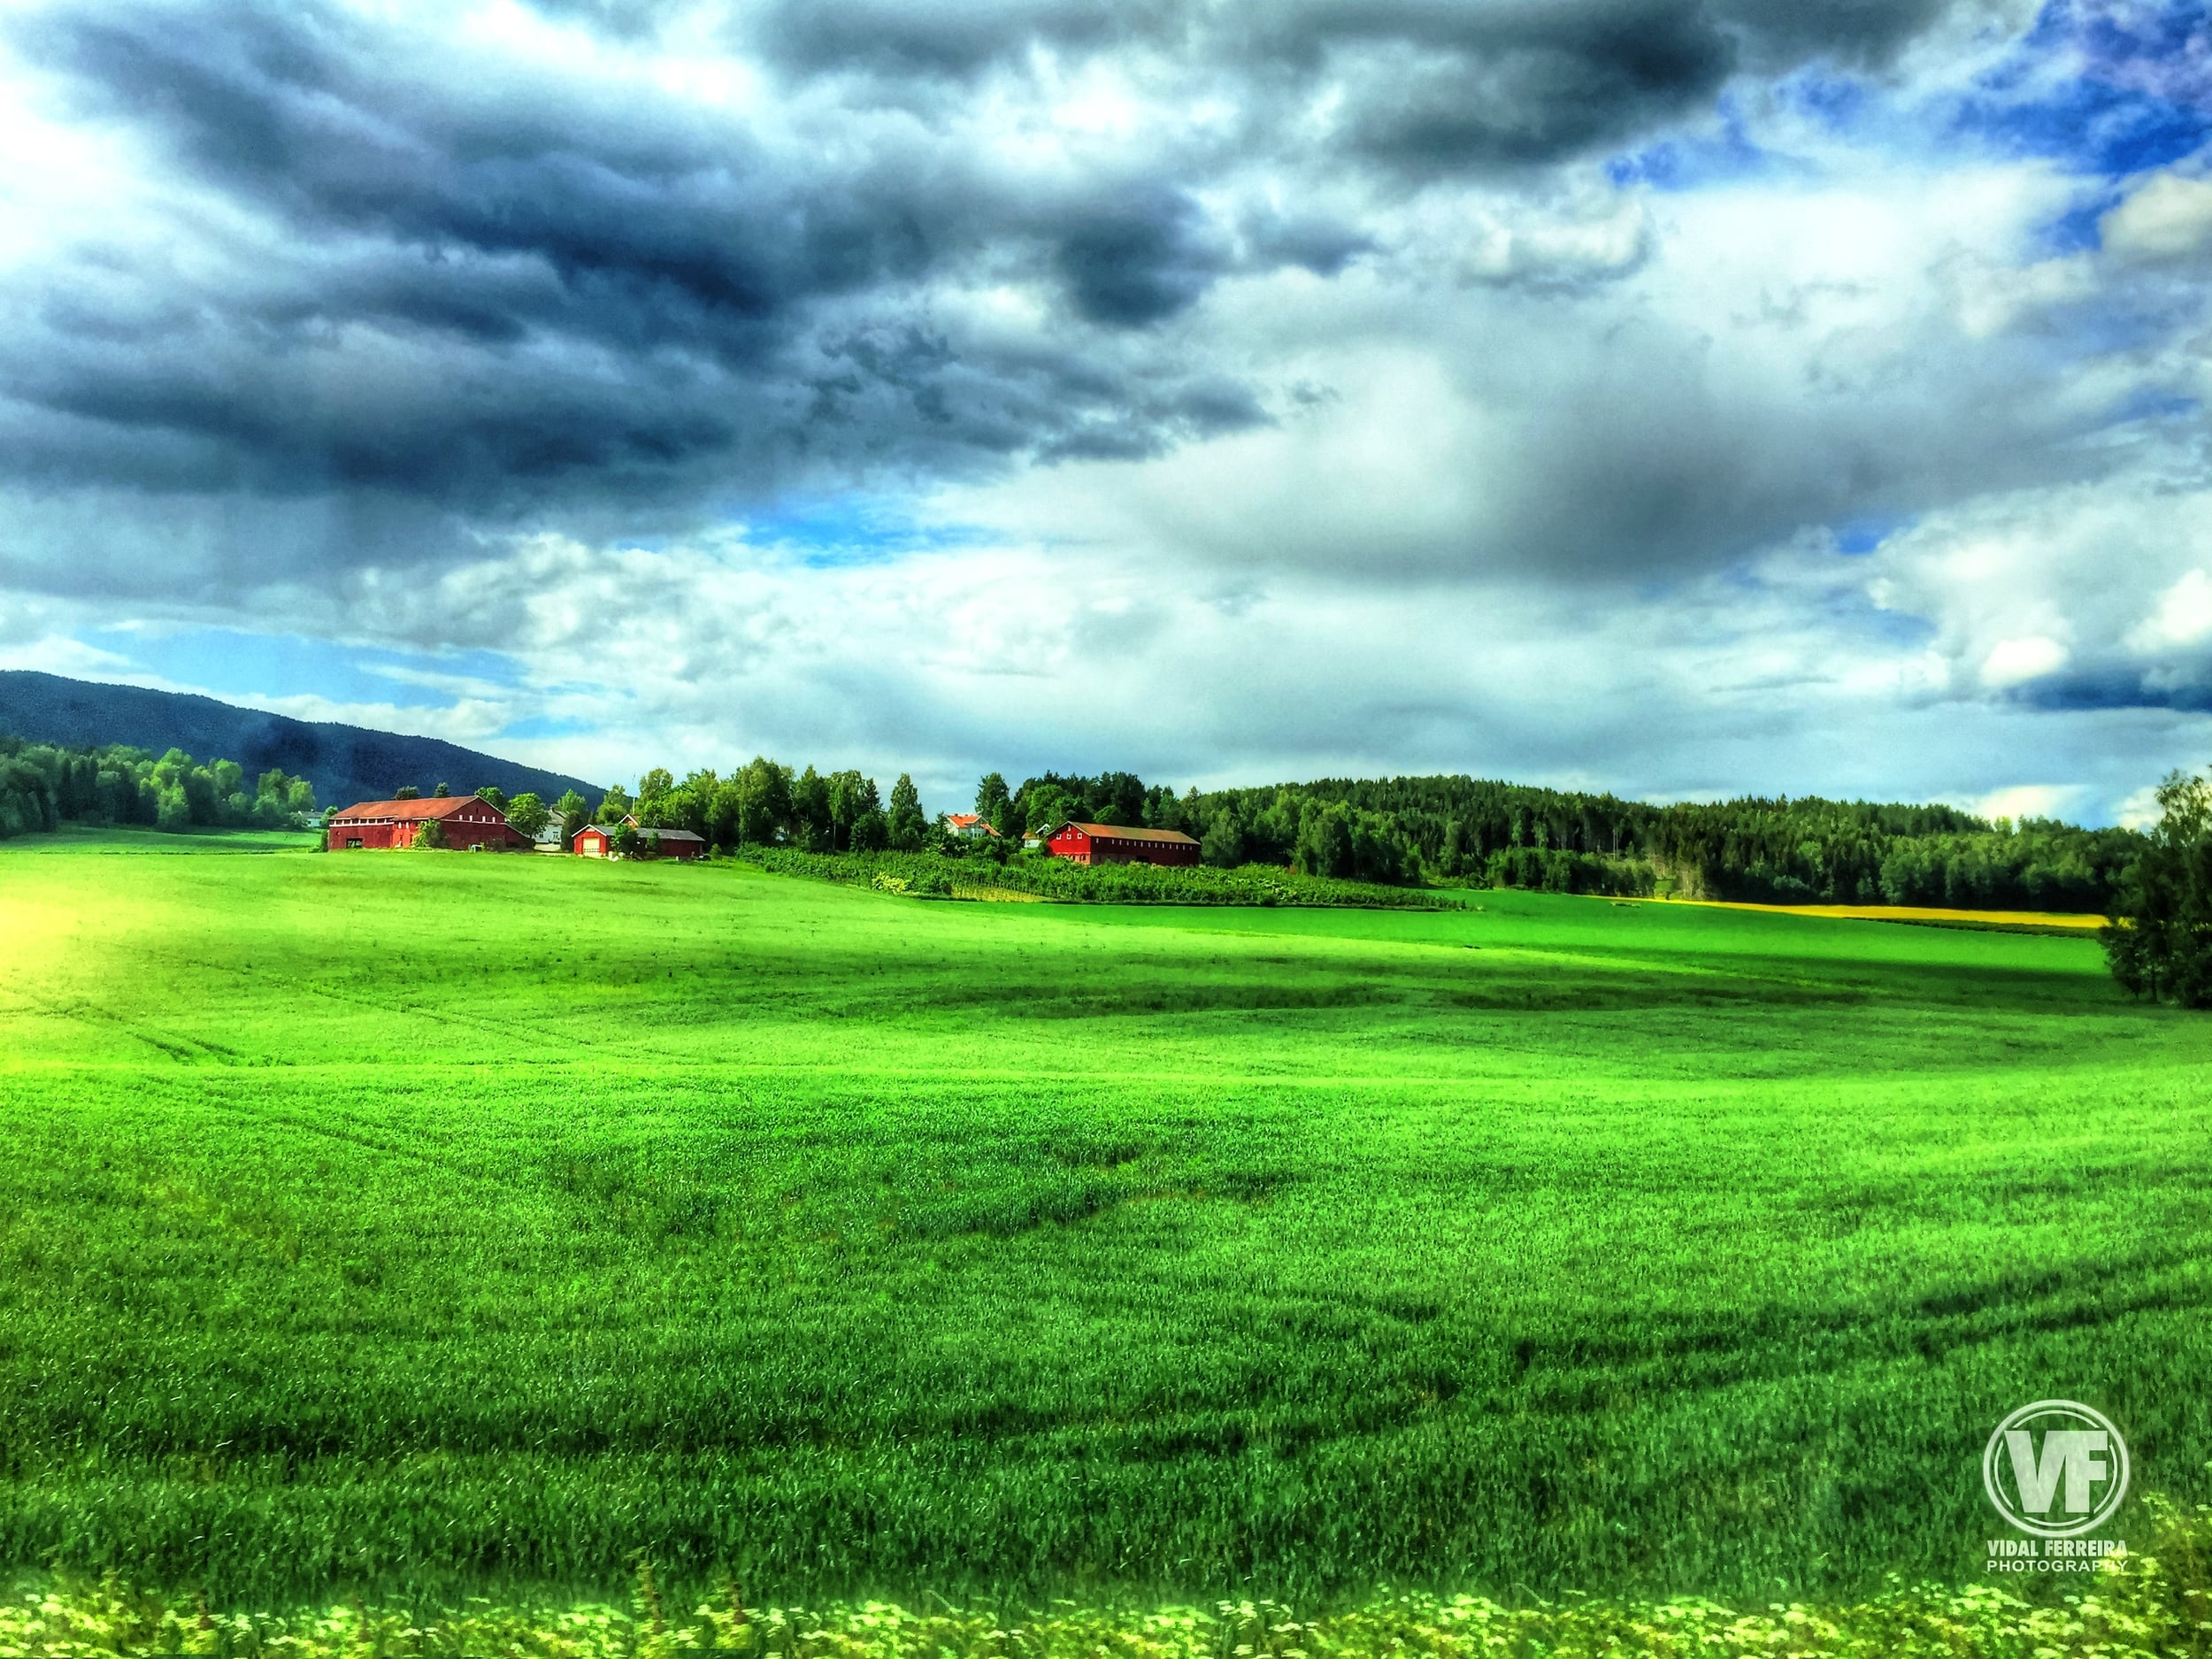 Serenity - Voss, Norway